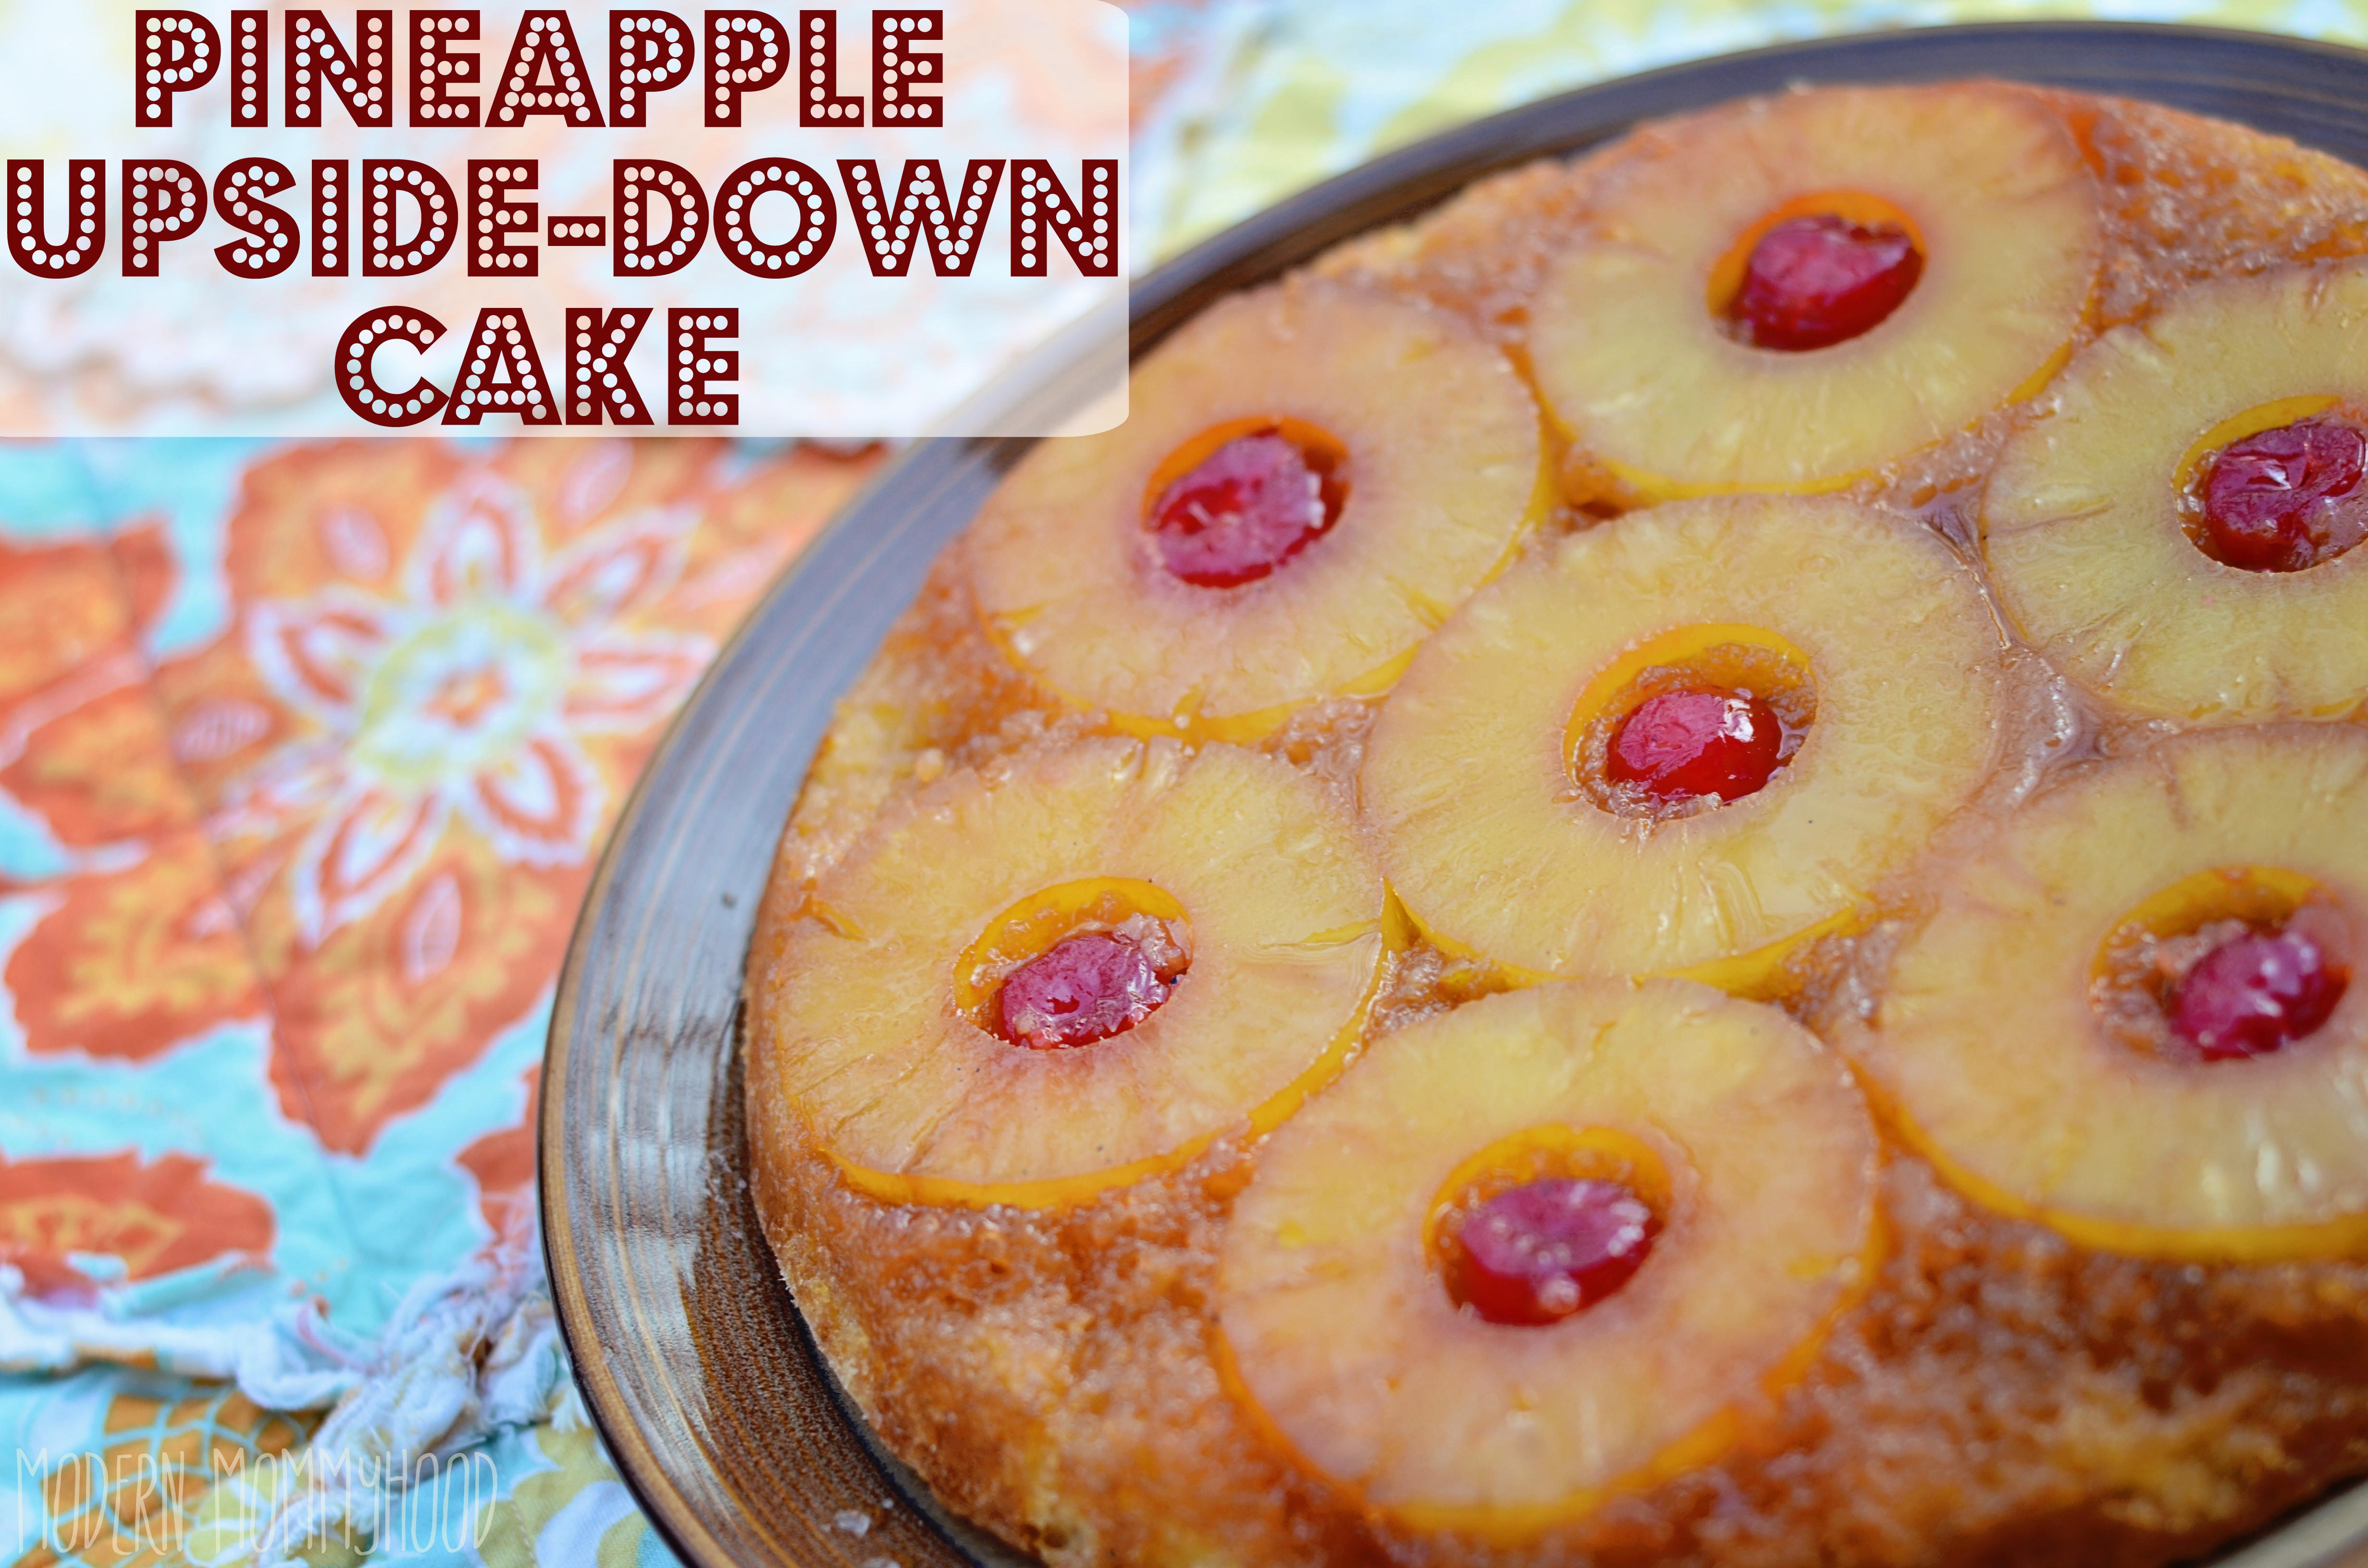 Pineapple Upside Down Cake Recipe  Pineapple Upside Down Cake Modernly Morgan